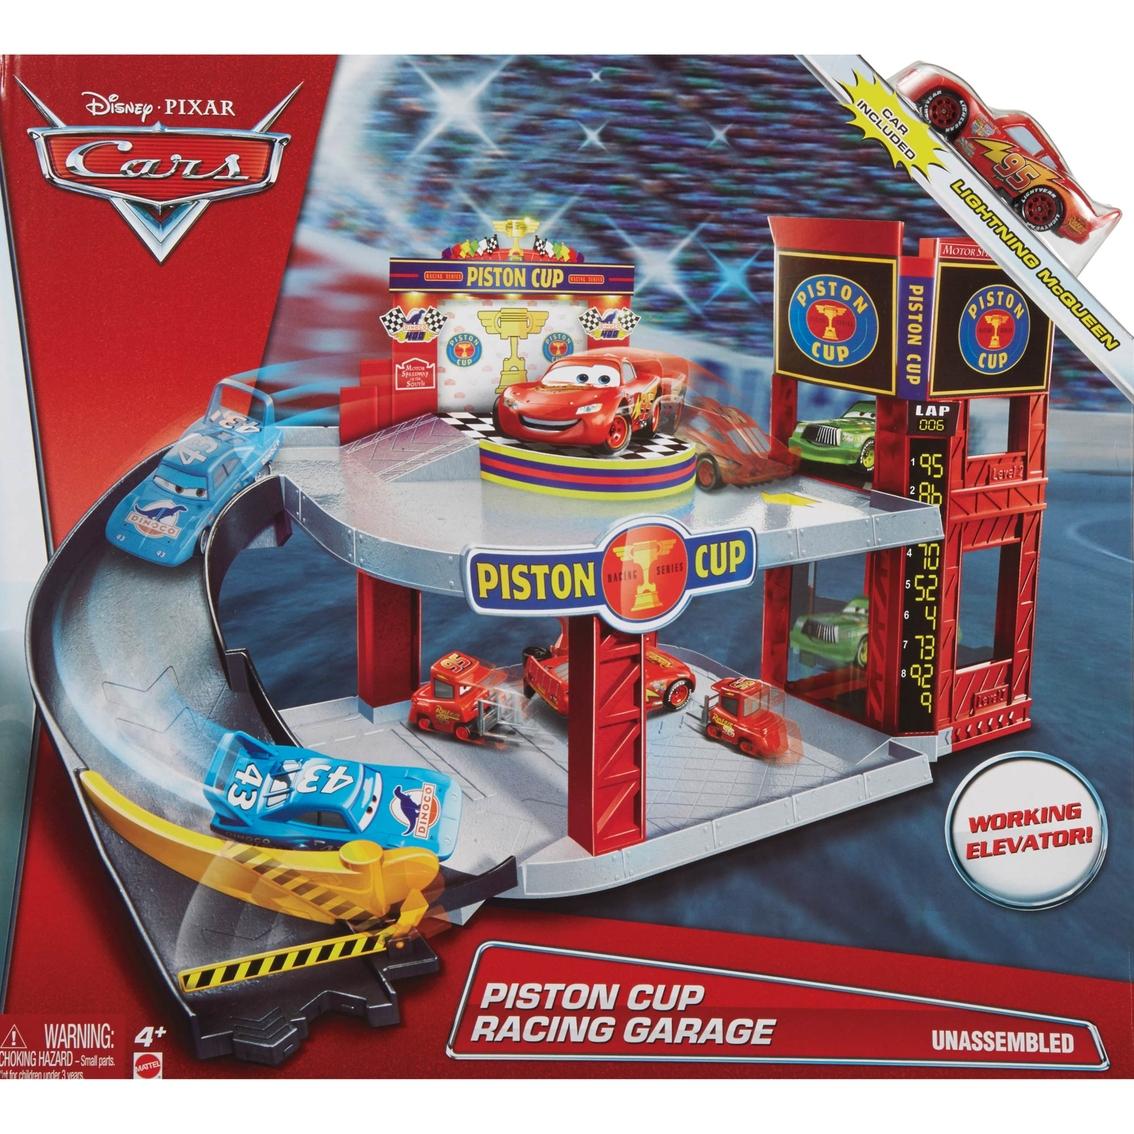 Disney Pixar Cars Piston Cup Racing Garage Specialty